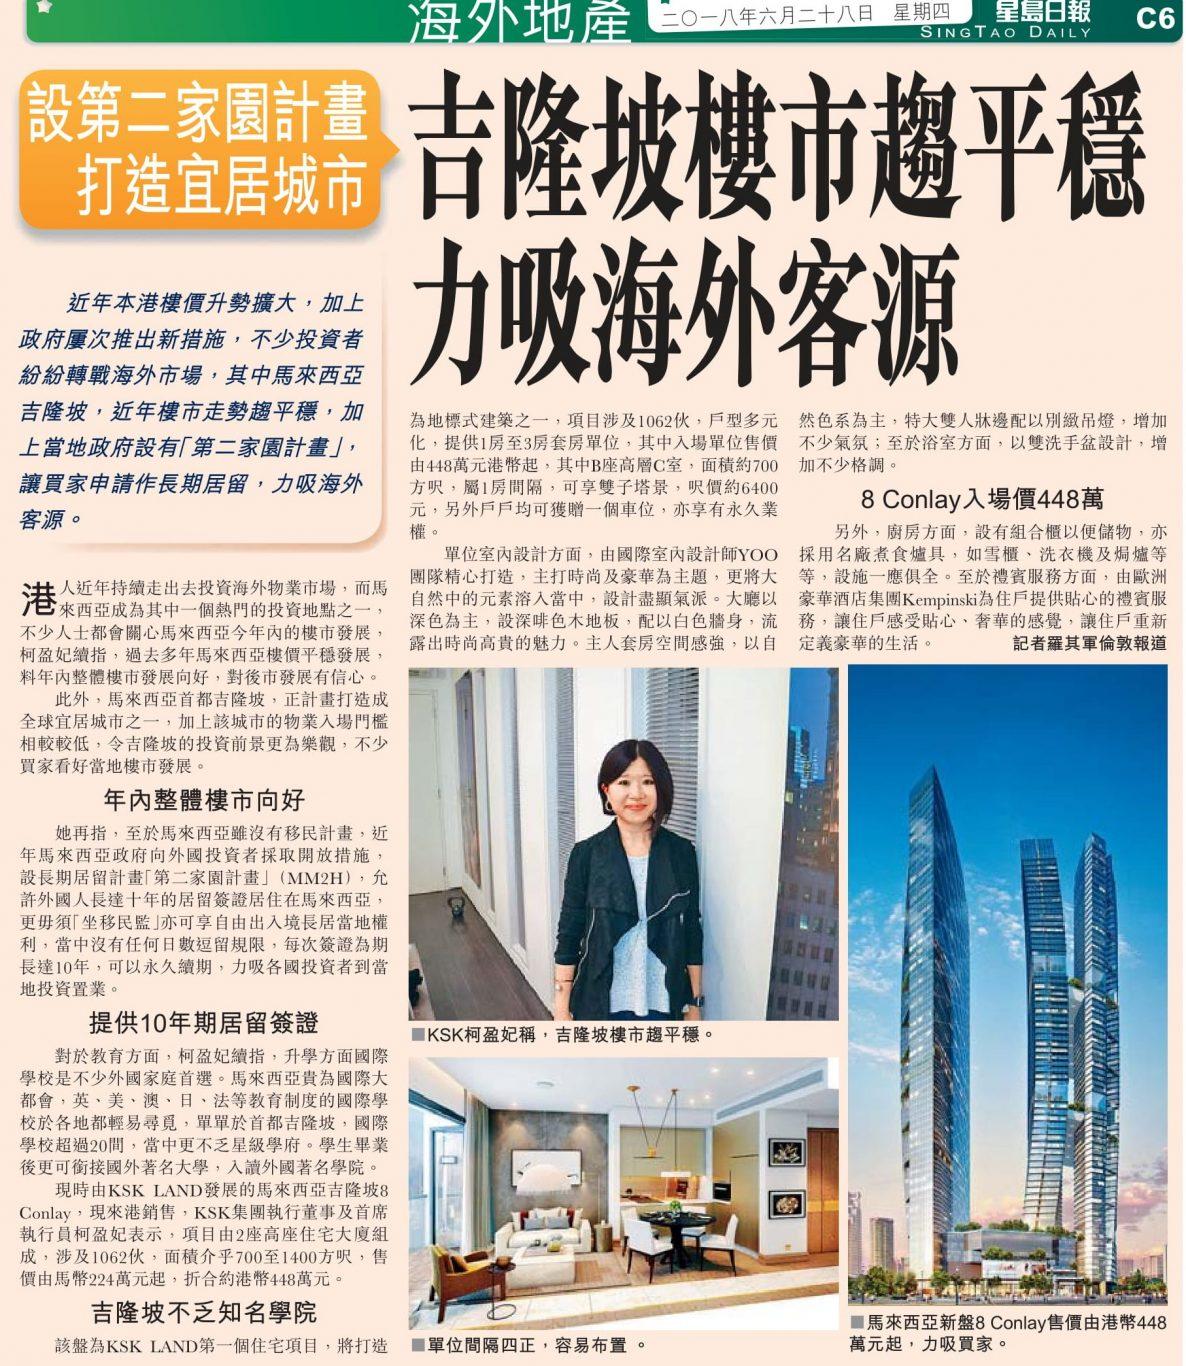 SingTao Daily